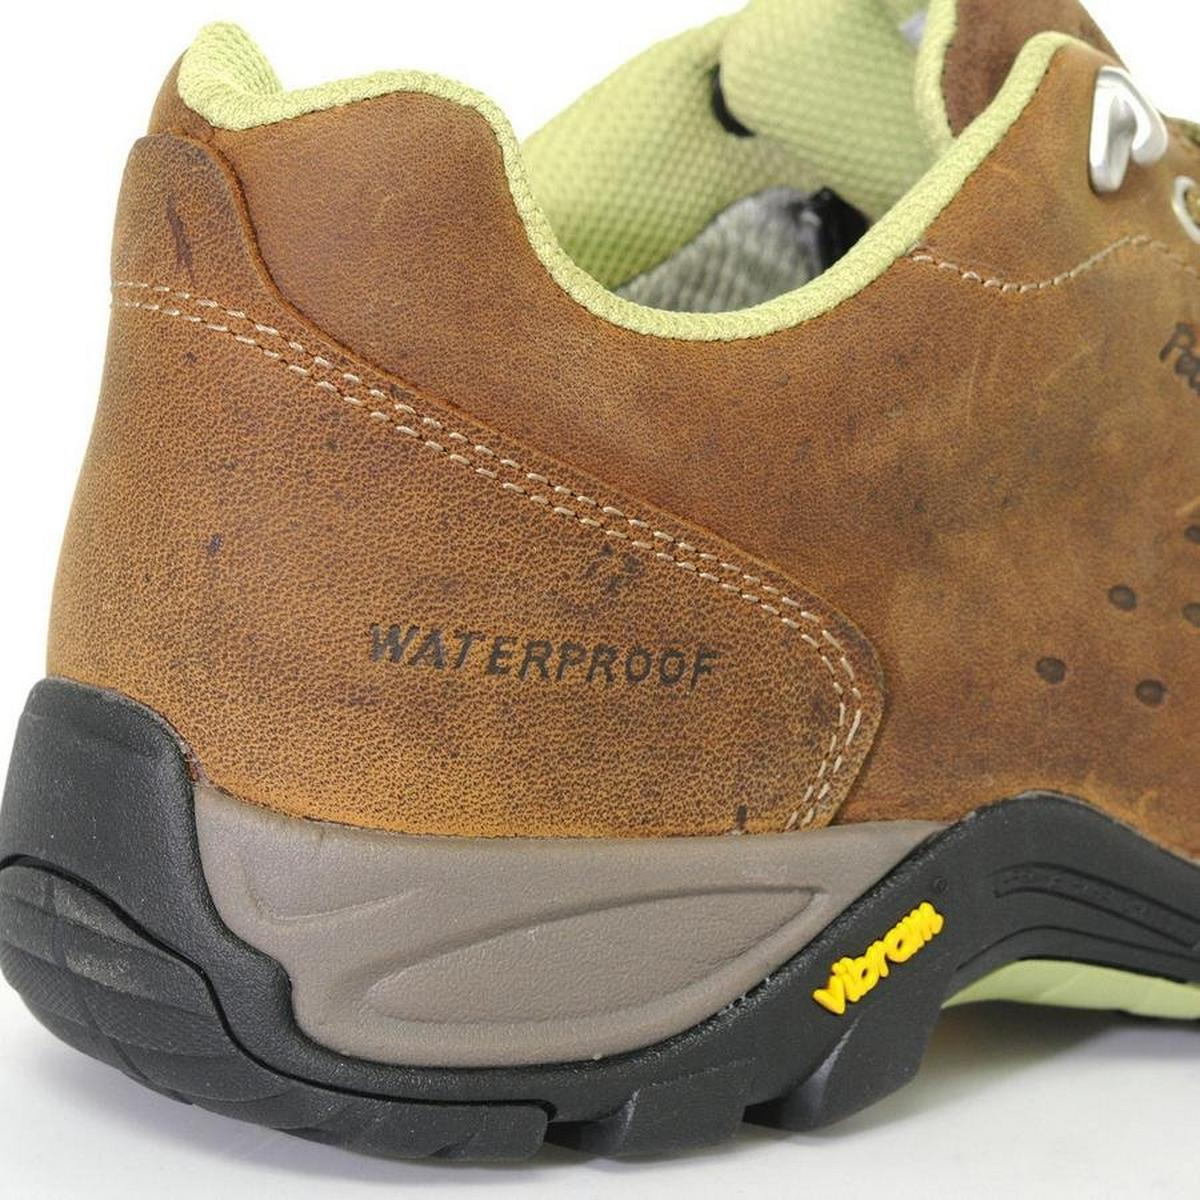 Peter Storm Women's Grizedale Waterproof Shoes